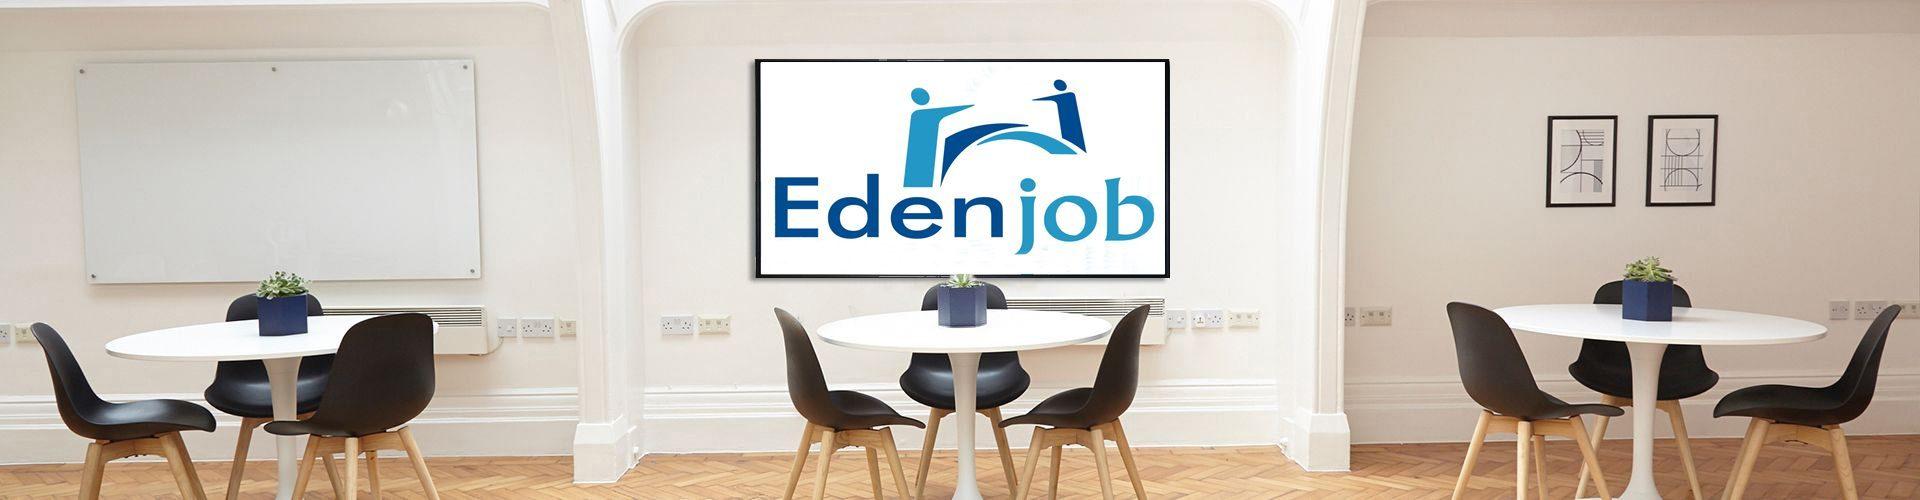 Eden Job